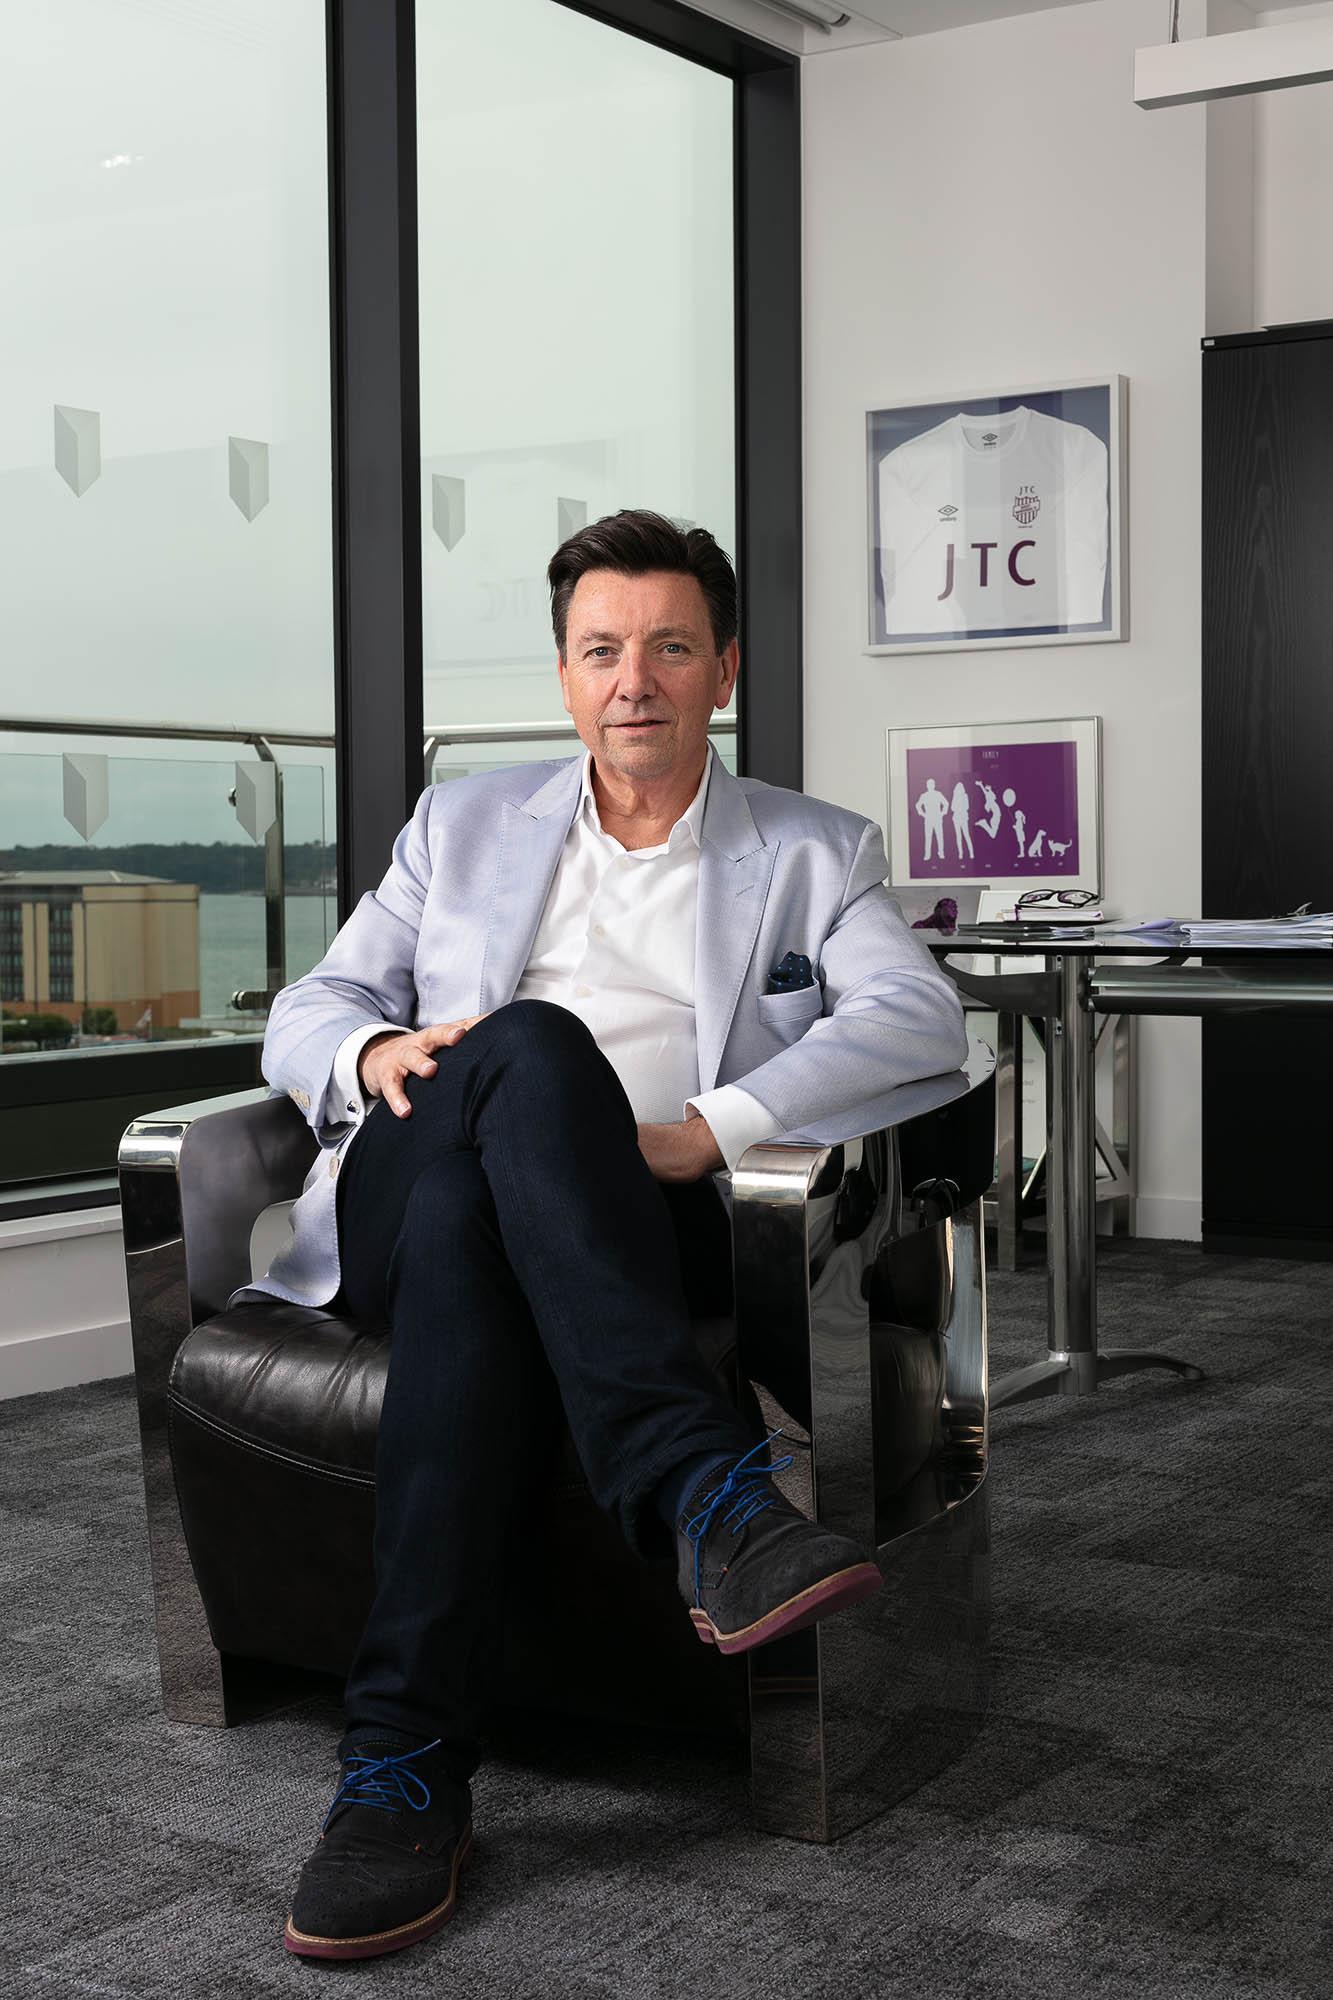 Nigel Le Quesne CEO of JTC